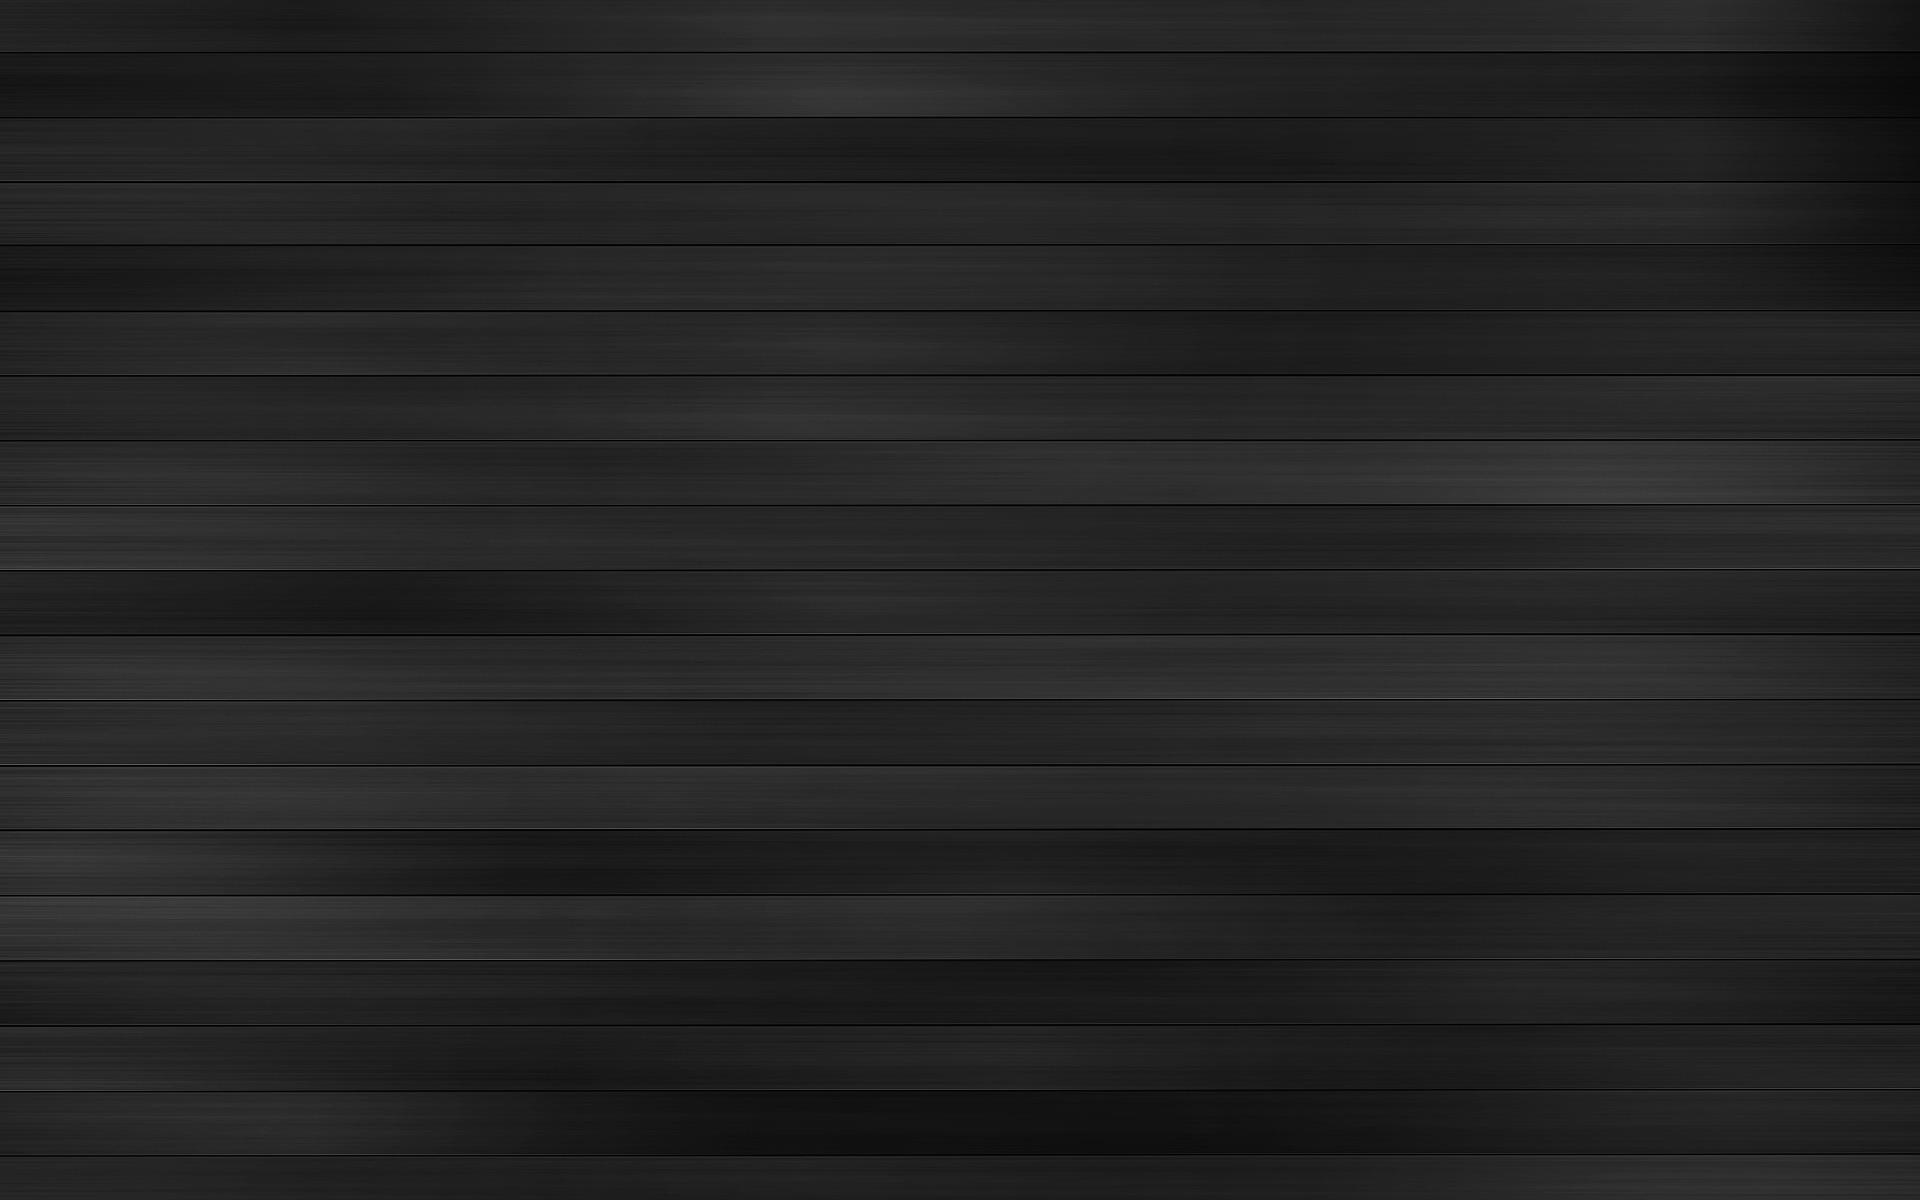 Dark Grey Wallpaper 14 - [1920x1200]